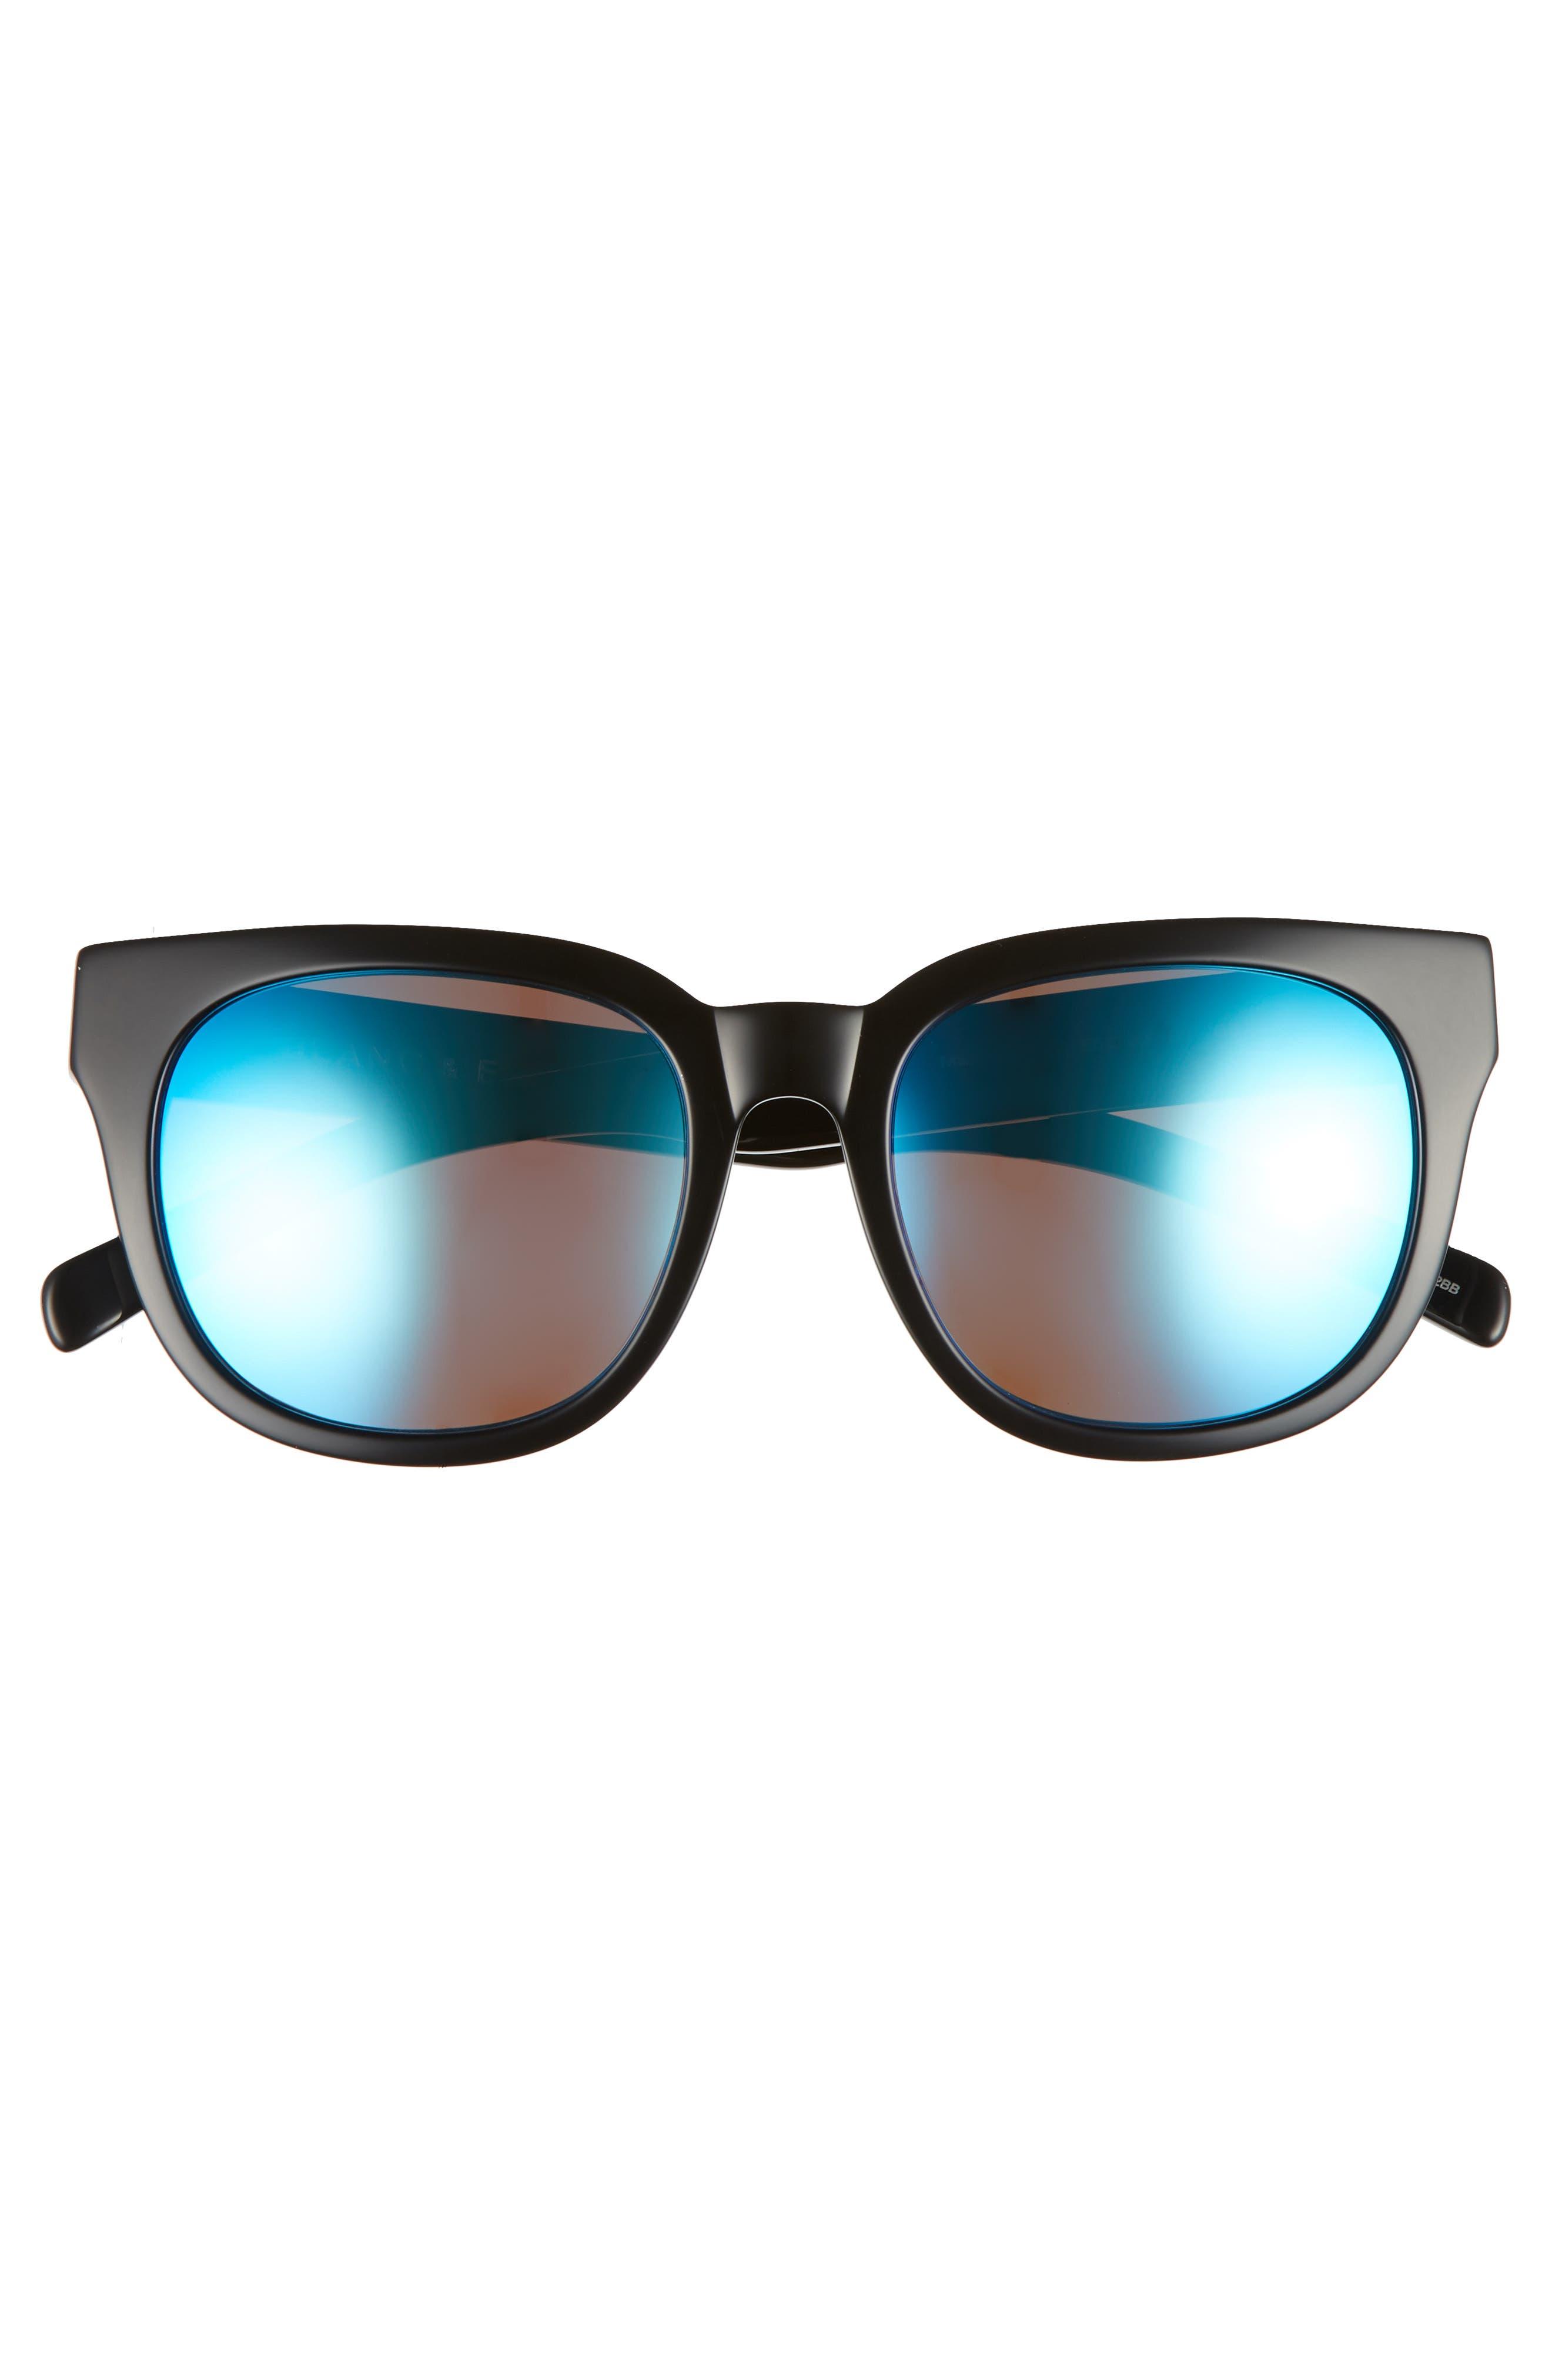 BLANC & ECLARE Seoul 55mm Polarized Sunglasses,                             Alternate thumbnail 3, color,                             002